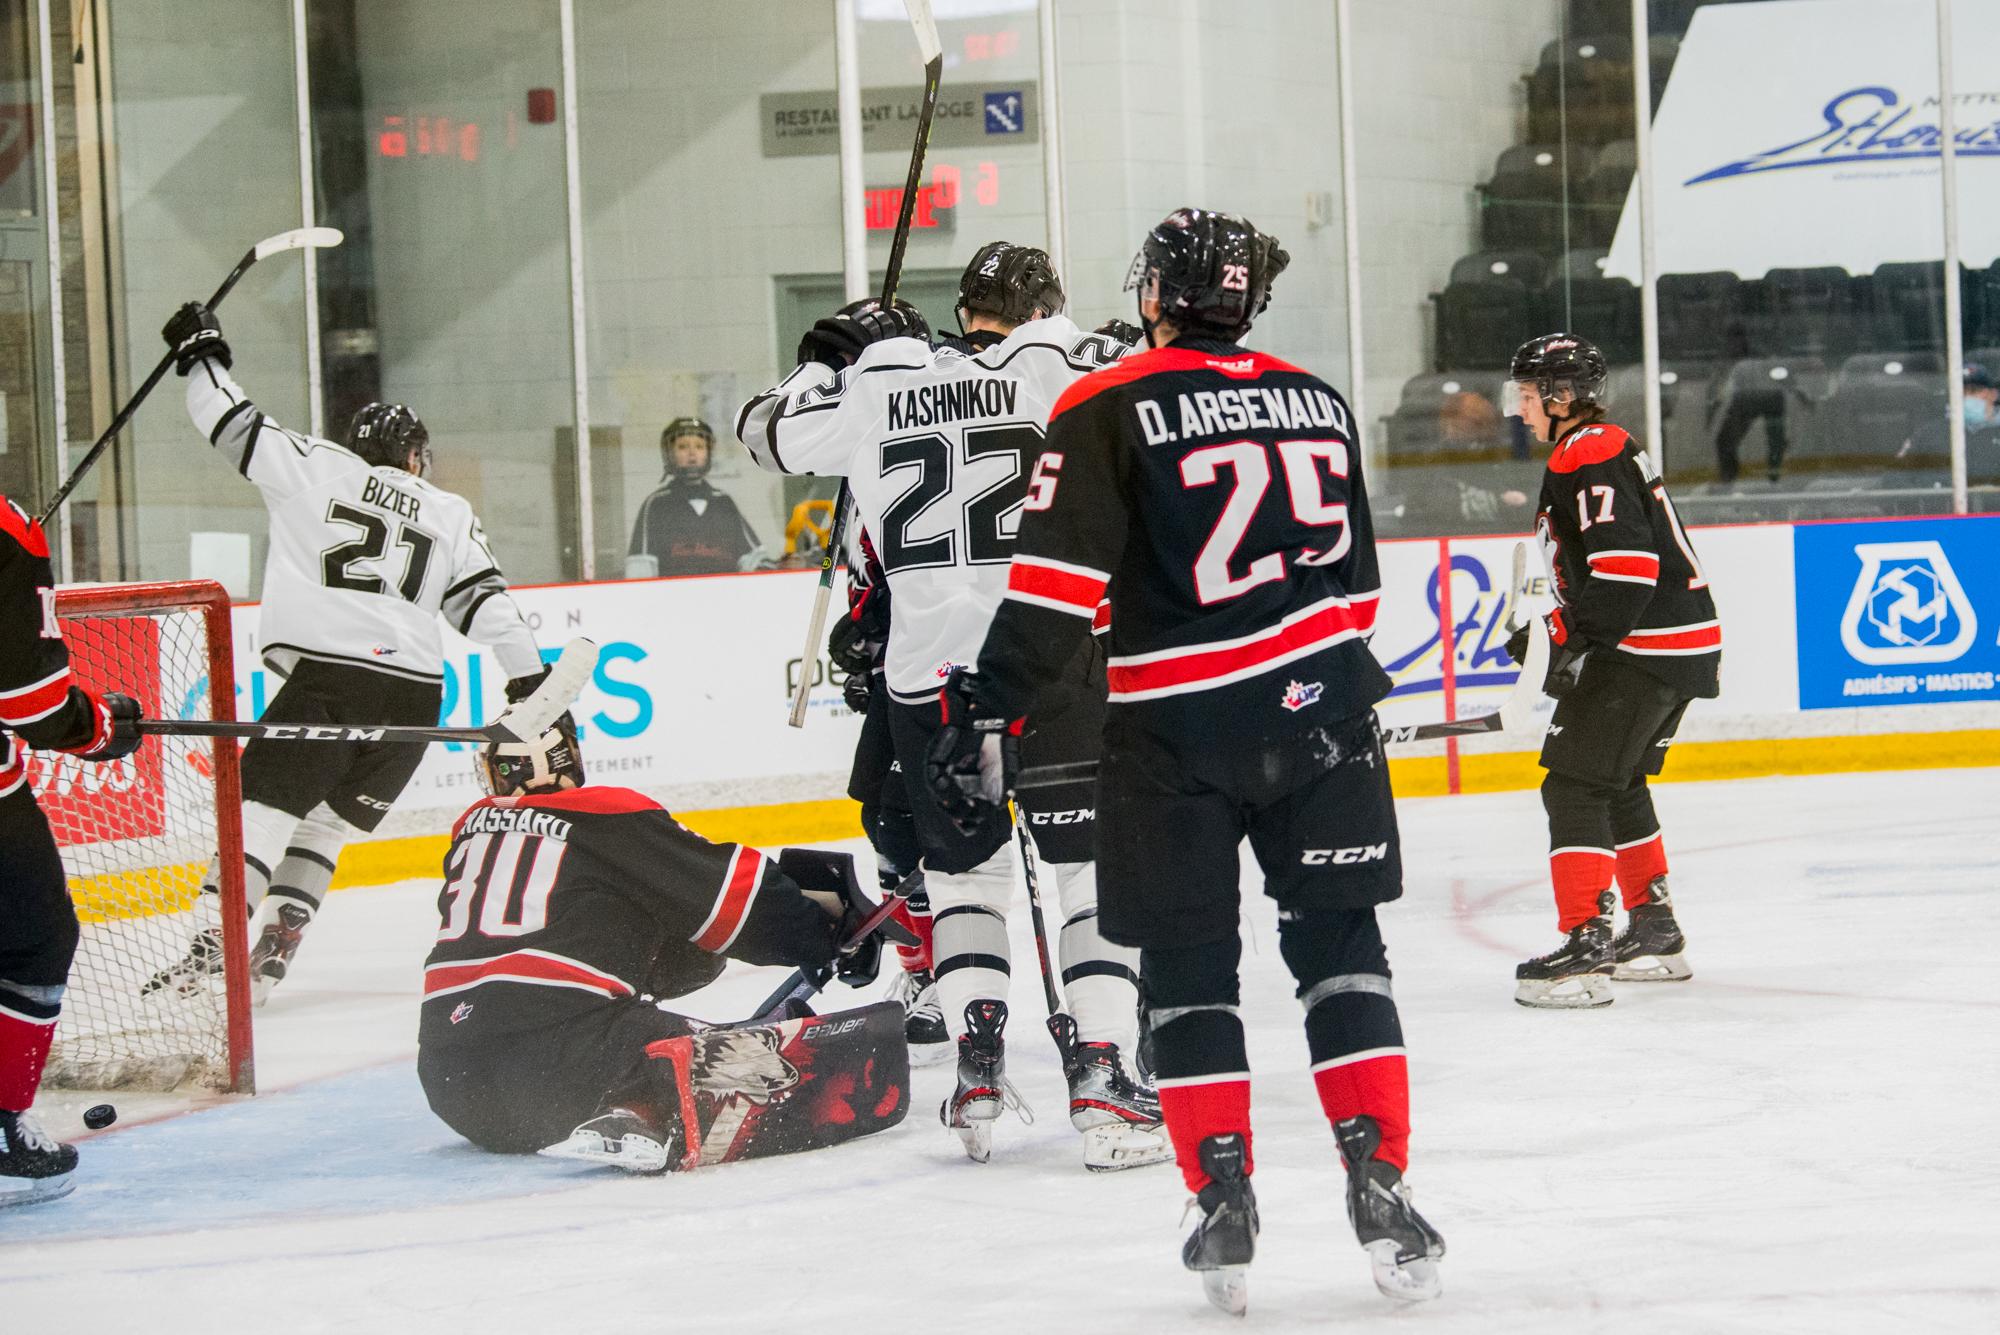 Huskies Rouyn-Noranda Olympiques Gatineau